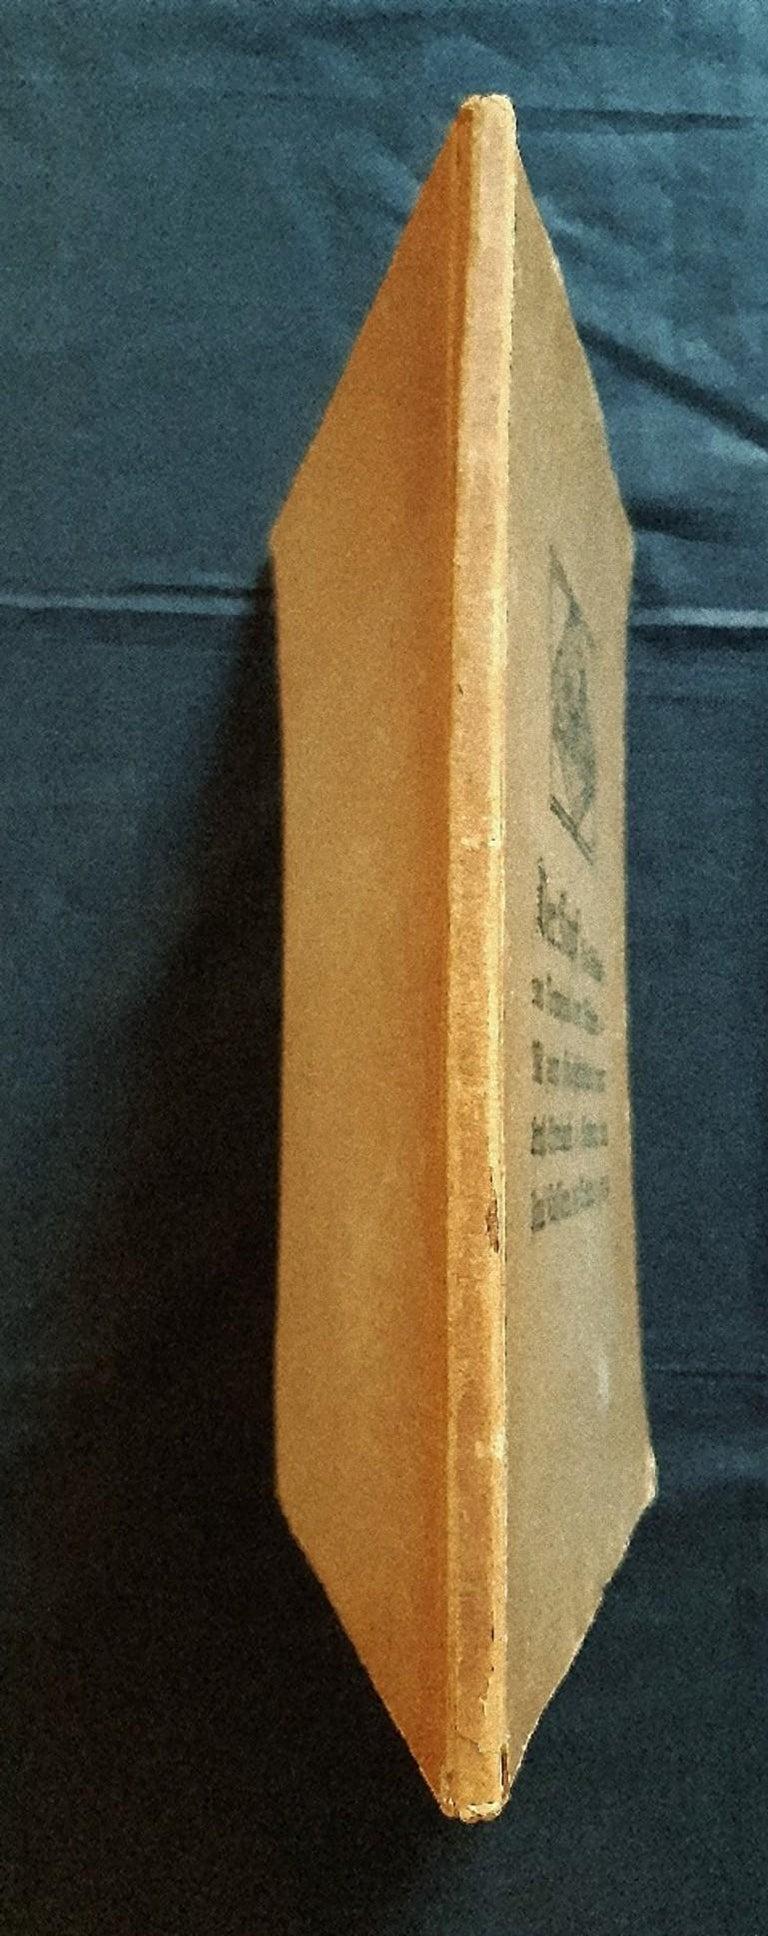 Der Kopf - Rare Book Illustrated by Ernst Barlach - 1919 For Sale 3